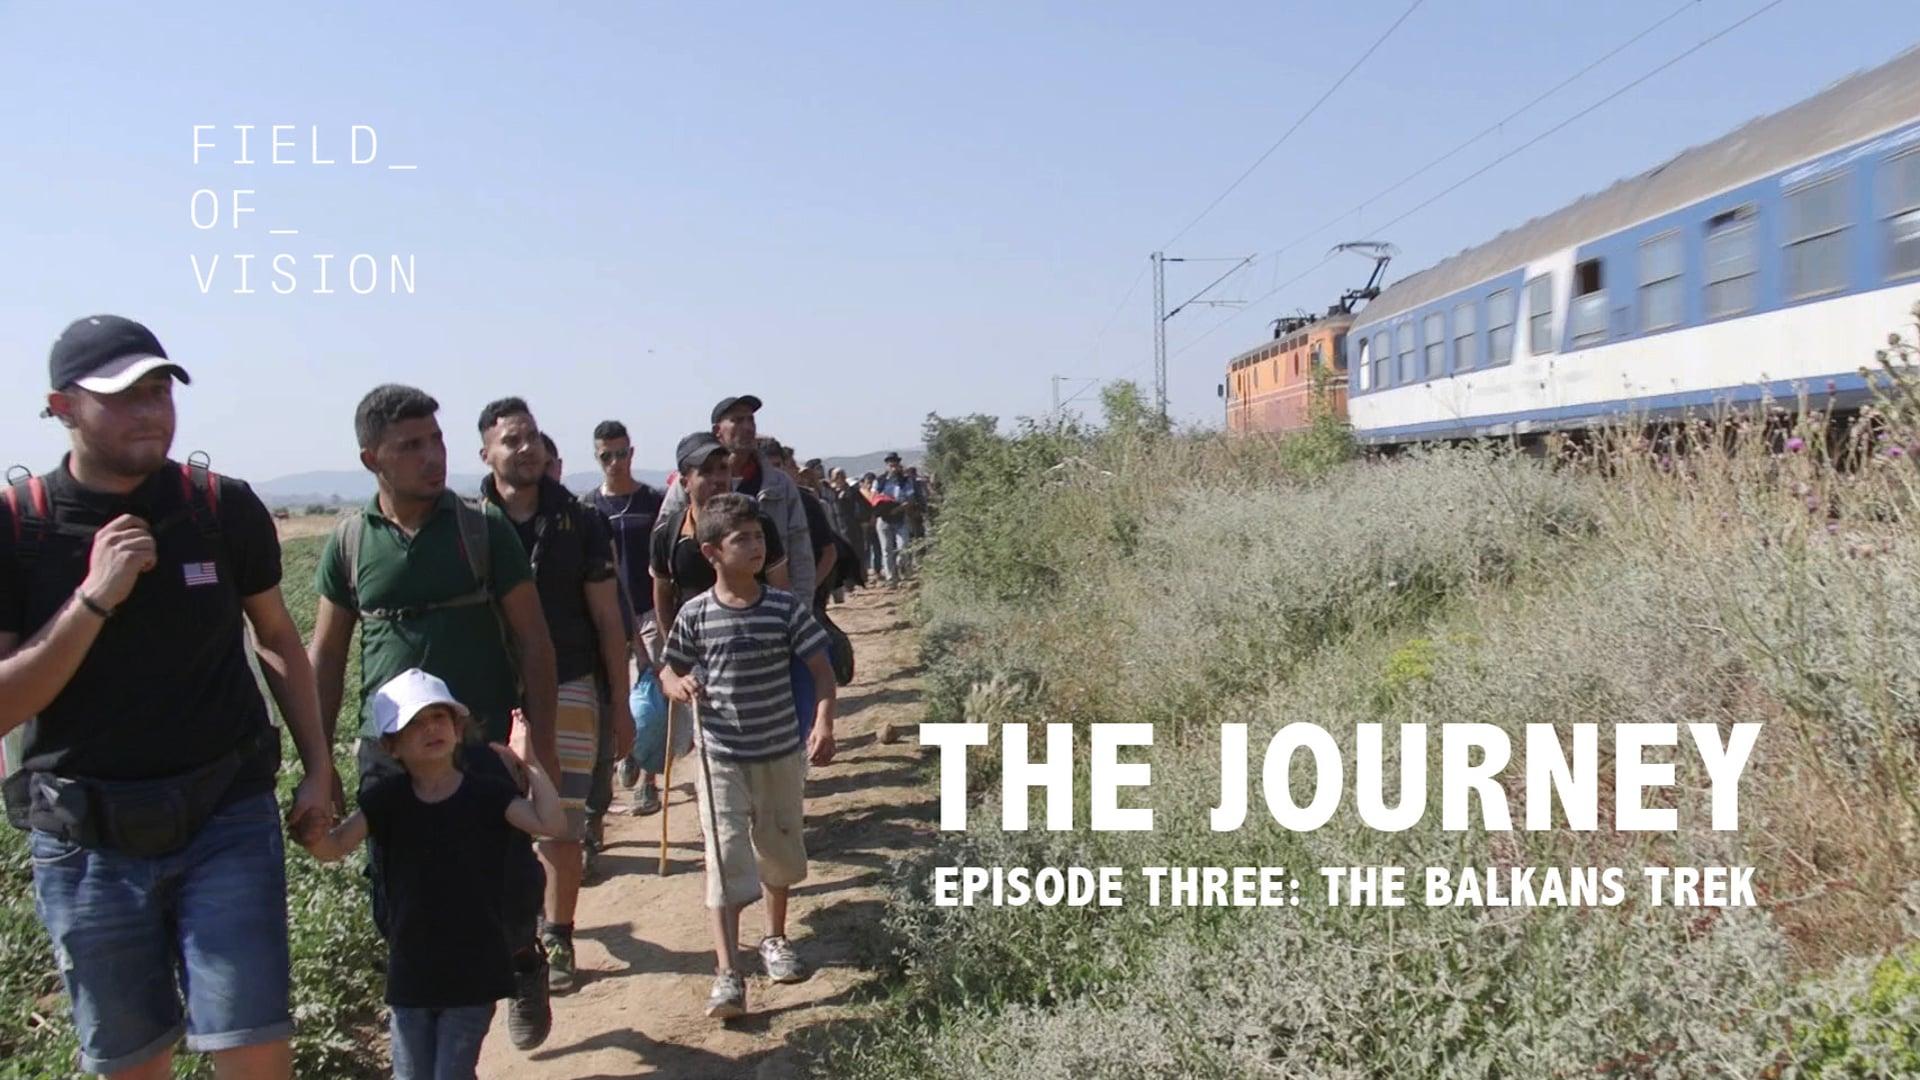 Episode Three: The Balkans Trek